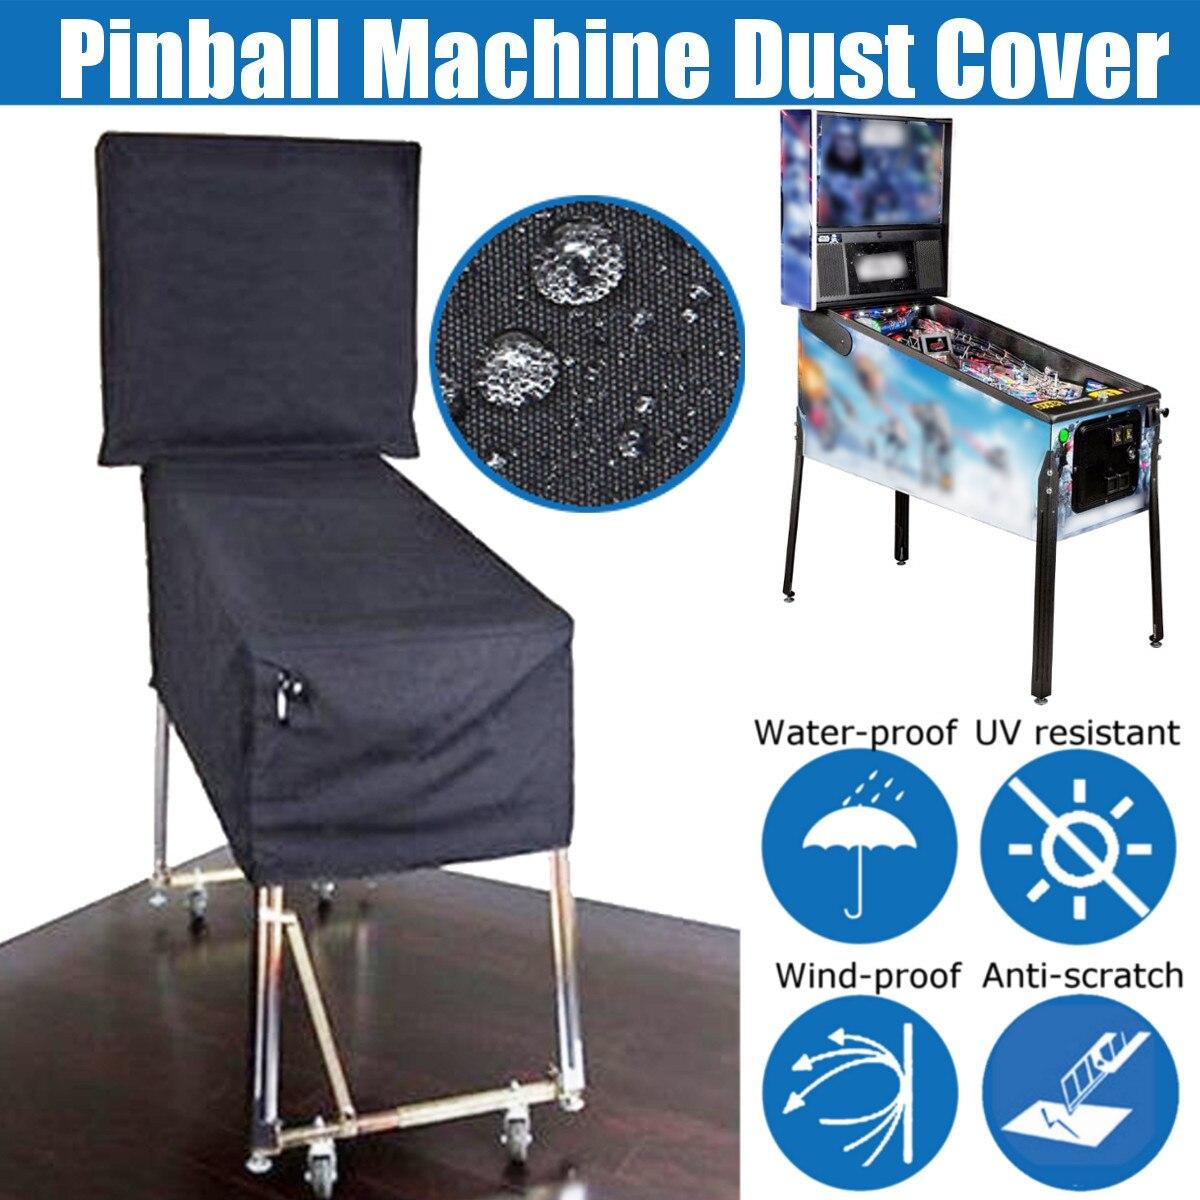 maquina-de-pinball-cubierta-impermeable-al-polvo-anti-uv-al-aire-libre-para-wedgehead-gottlieb-80bally-de-fuselaje-ancho-90-70-80s-piezas-pinball